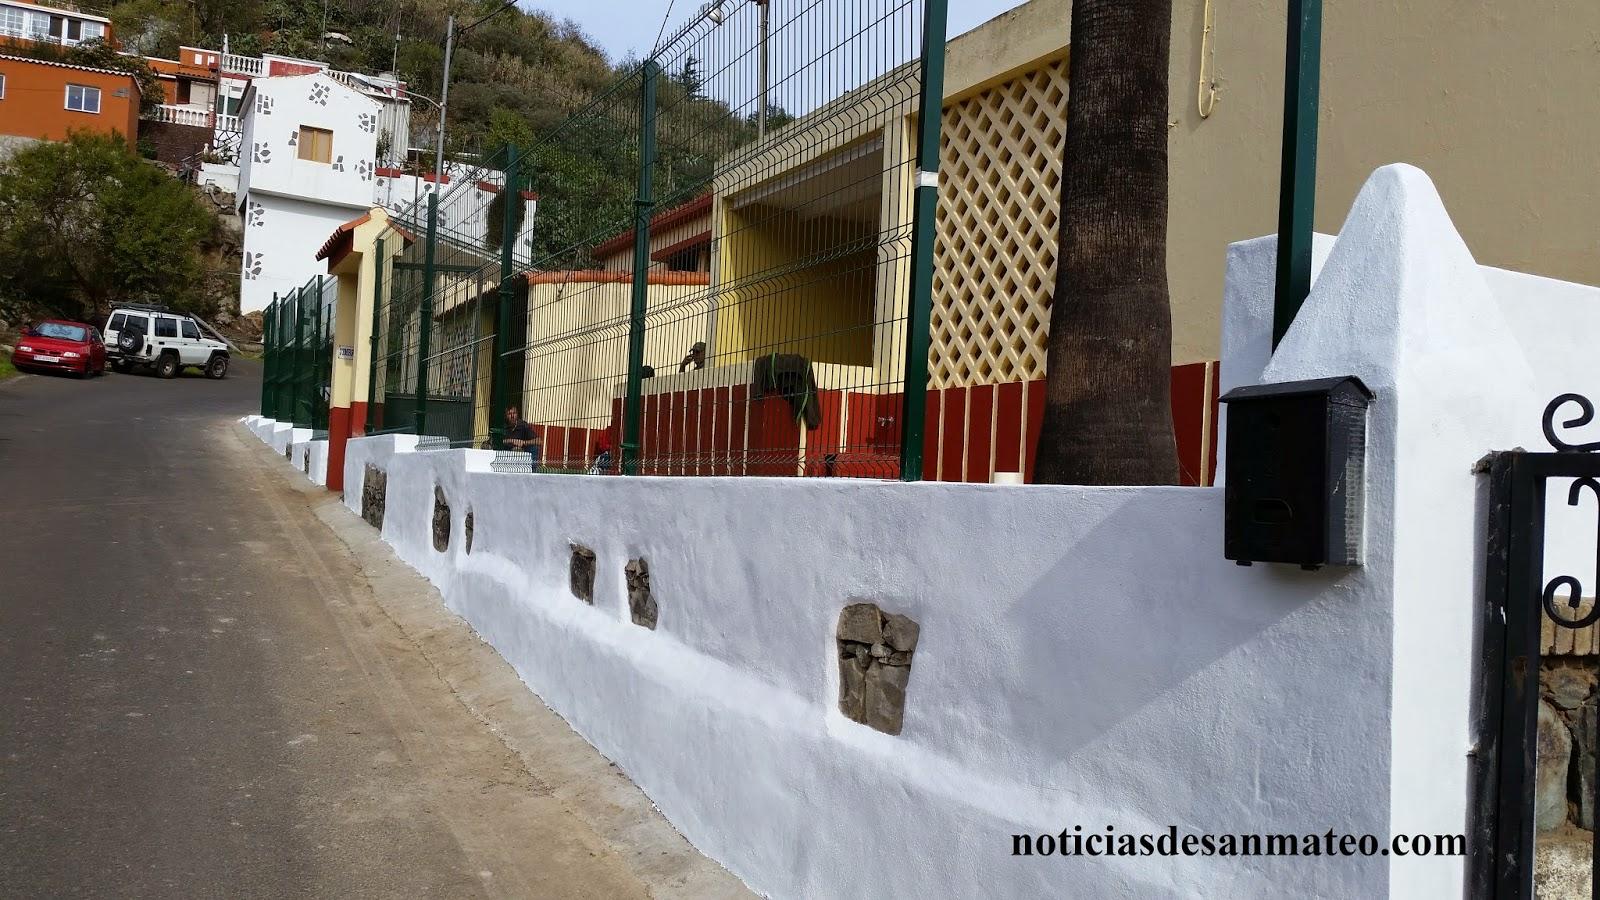 Colegio La Lechuza Noviembre 2014